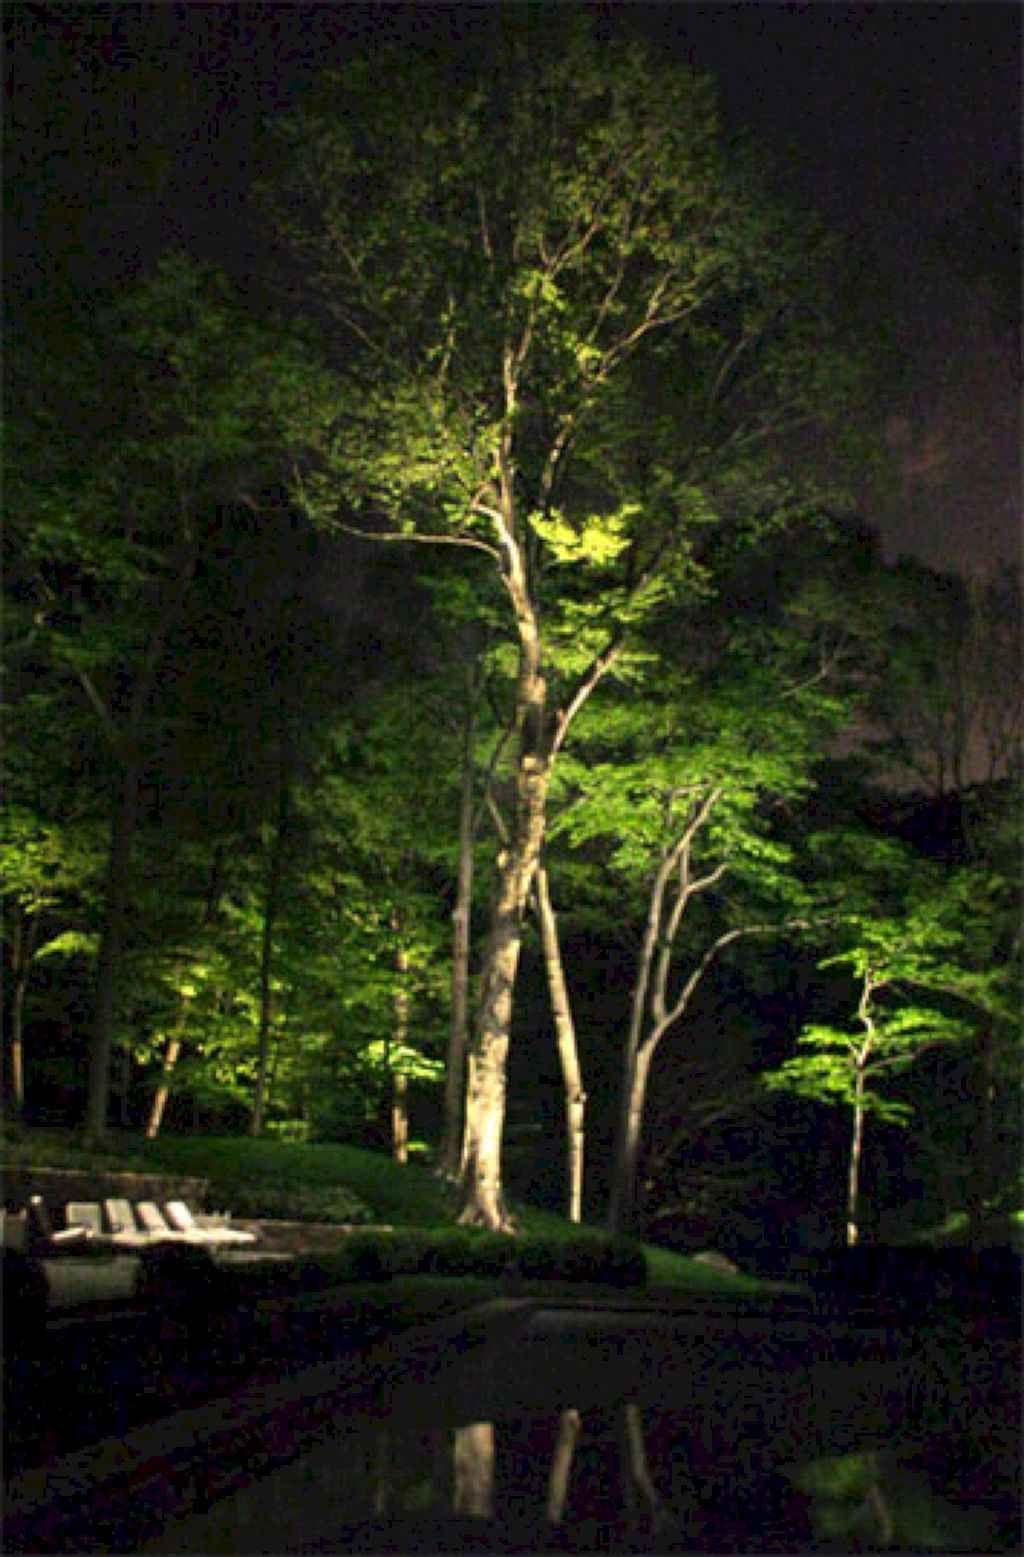 48 Inspiring Backyard Lighting Ideas Garden And Landscaping Outdoor Tree Lighting Landscape Lighting Design Backyard Lighting